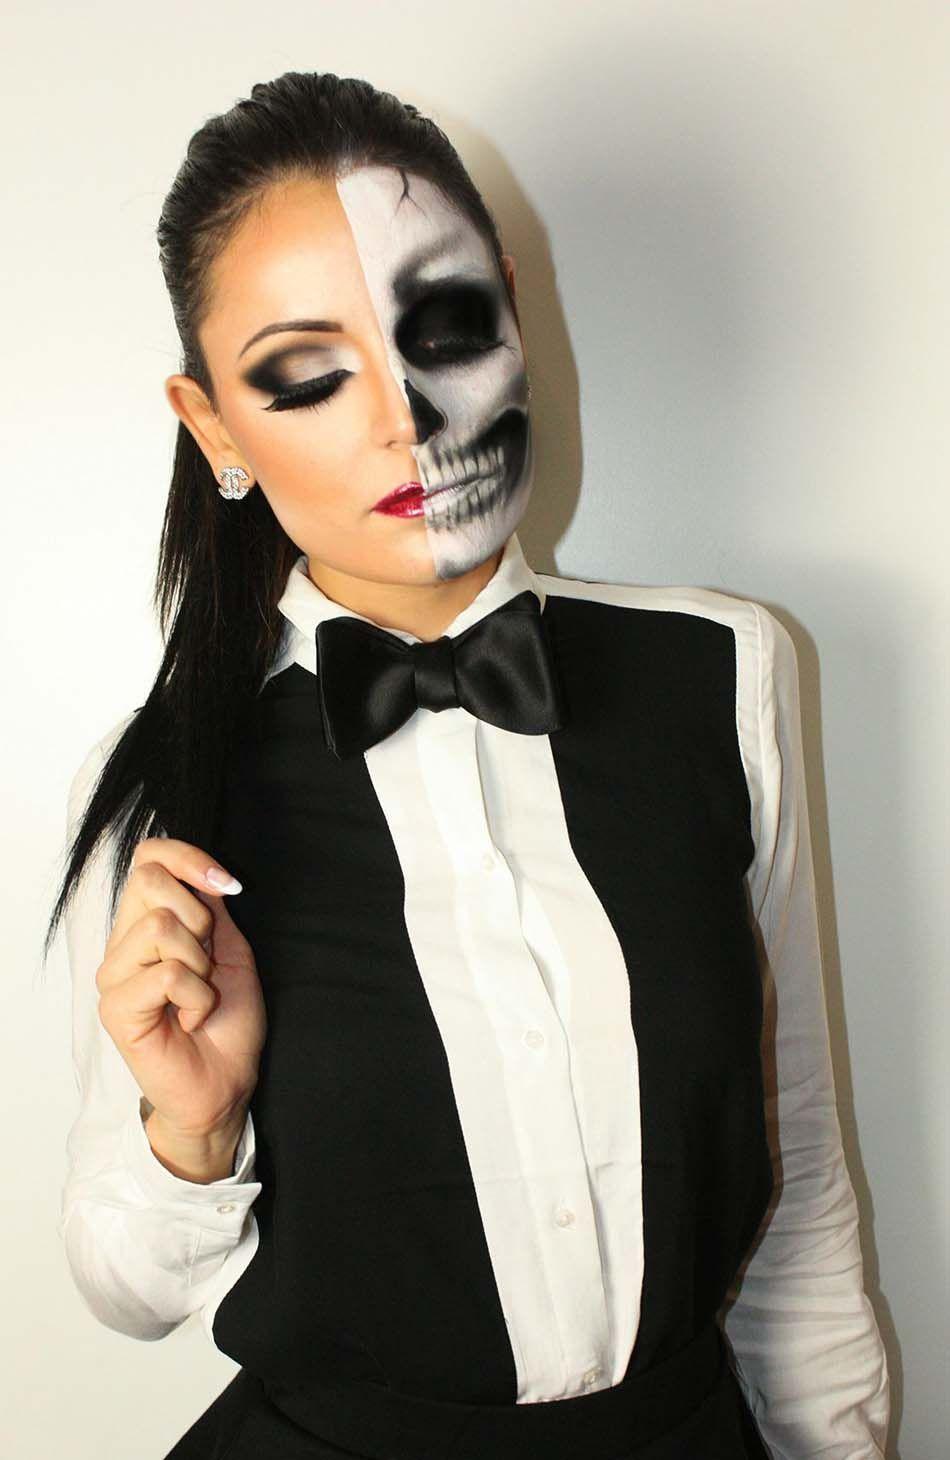 Maquillage halloween femme moitié squelette